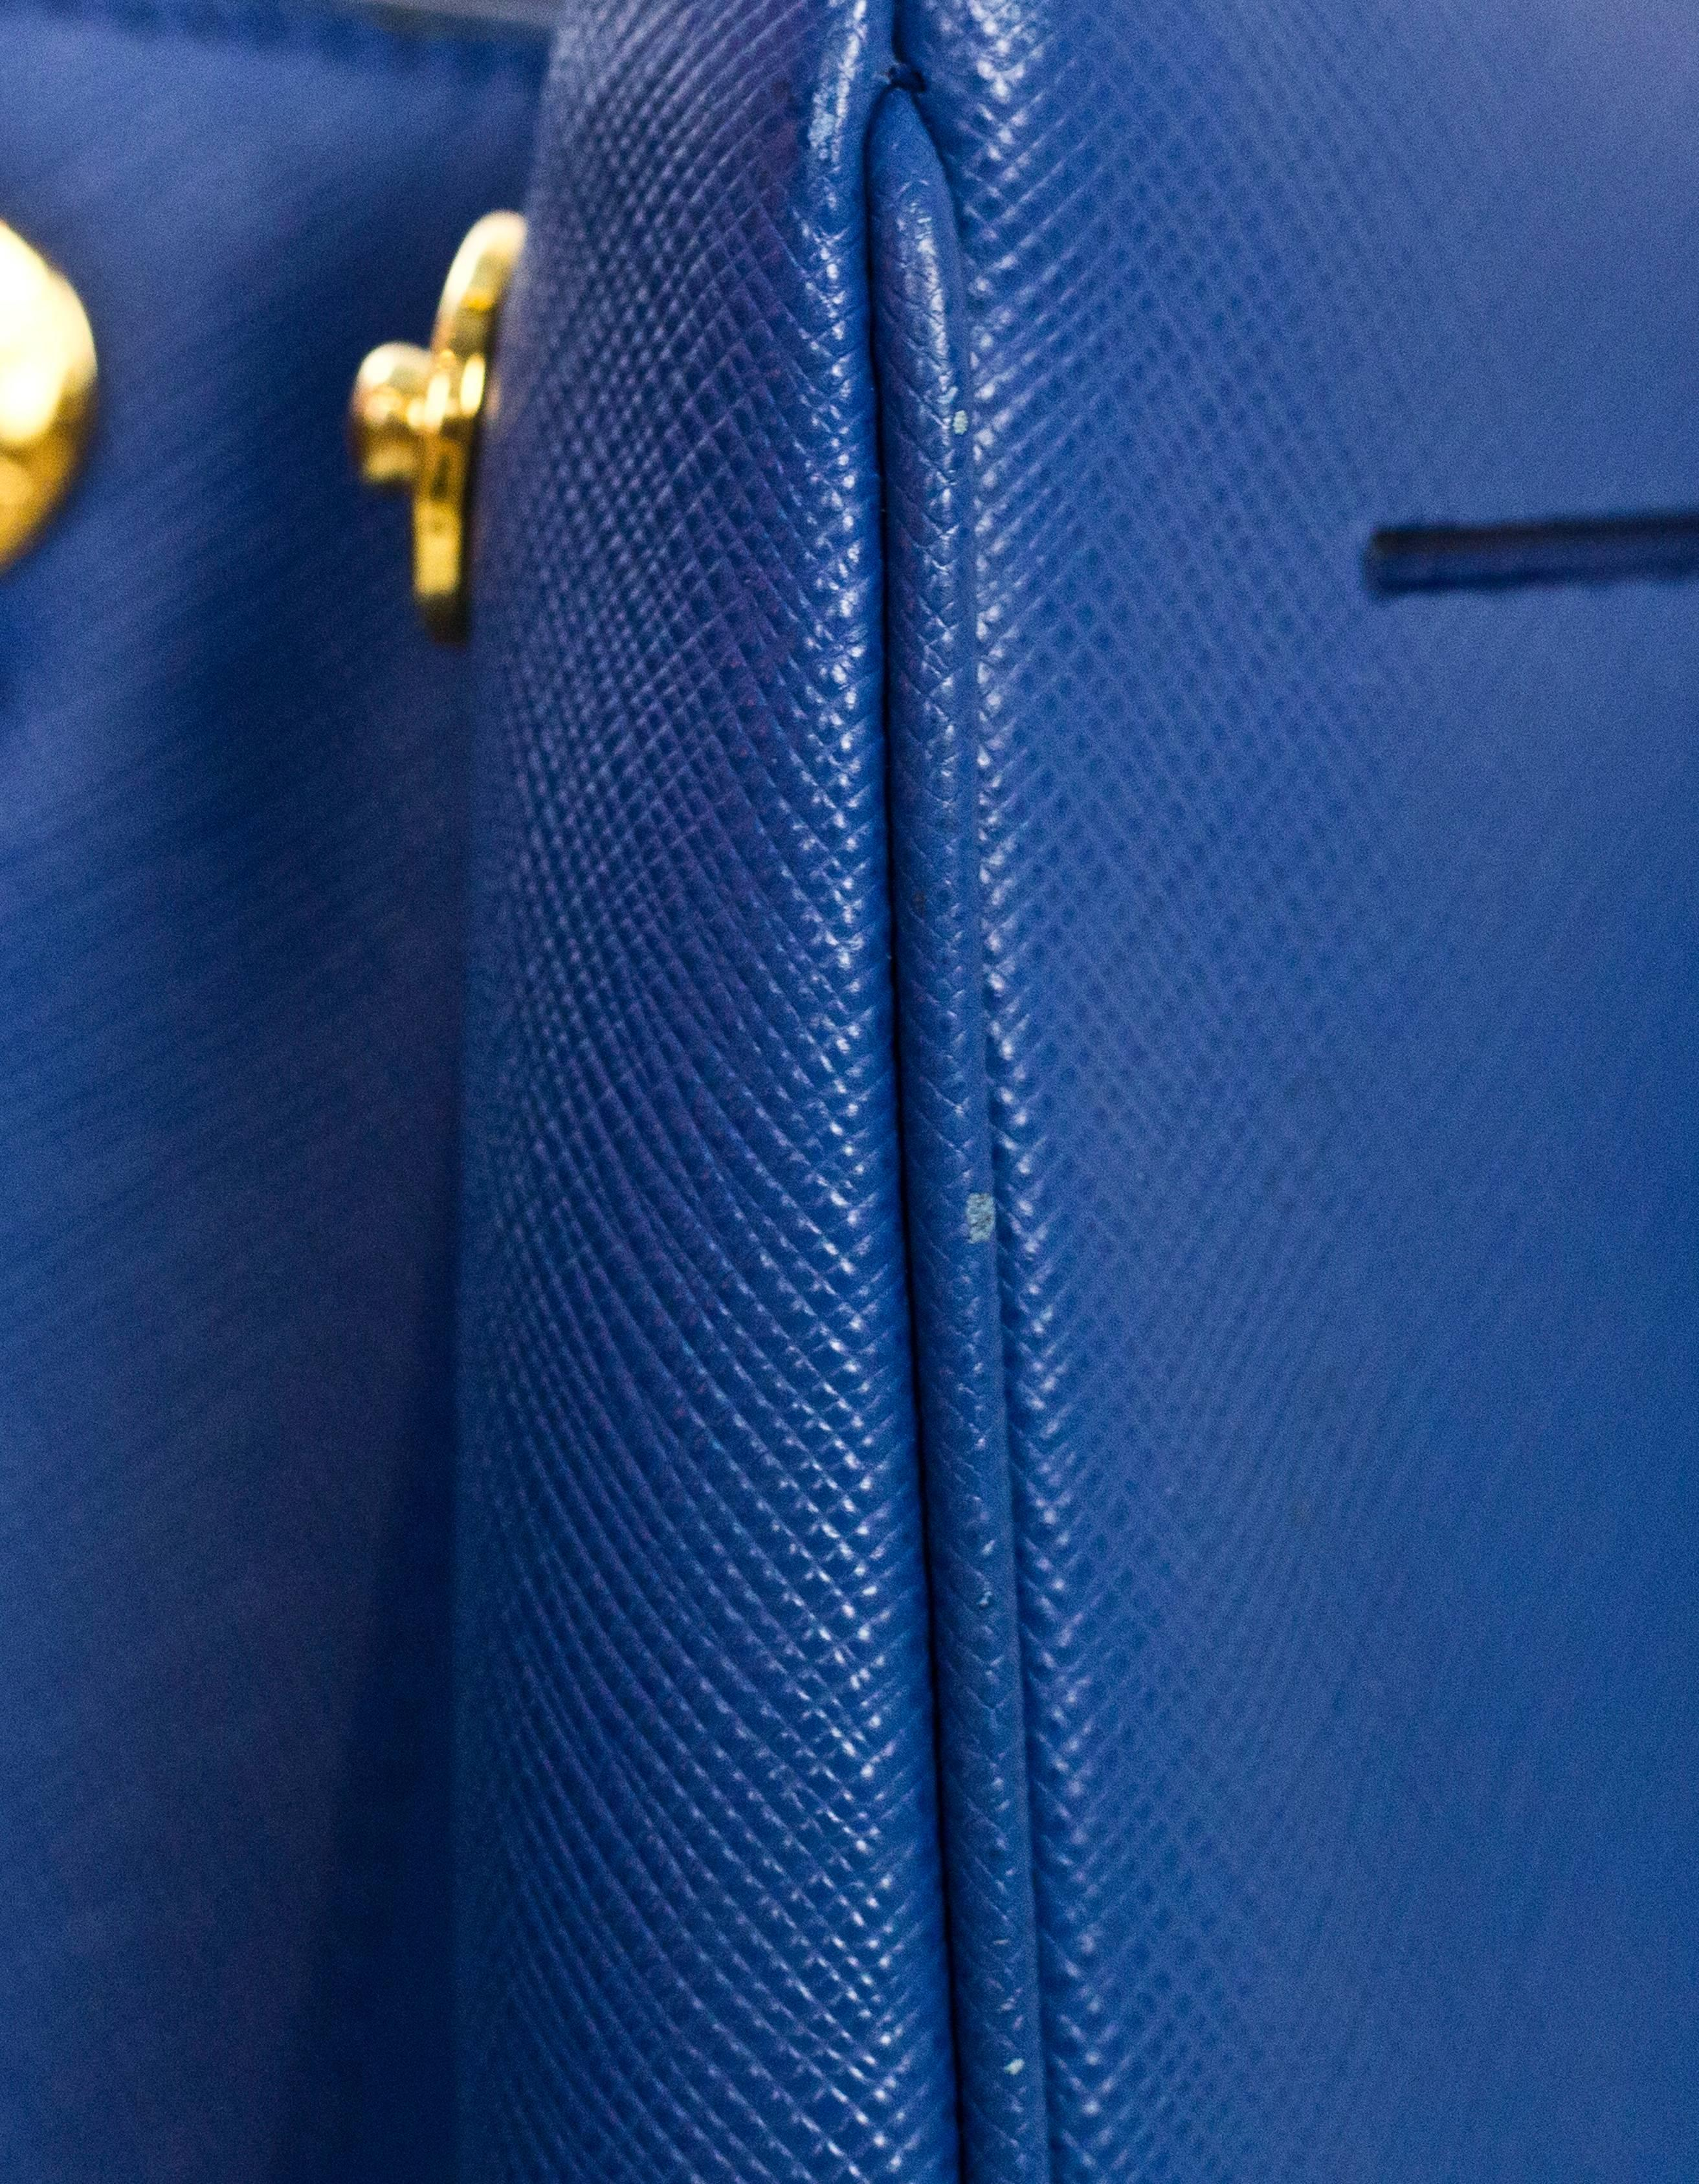 c470248971cc ... sale prada blue medium galleria saffiano leather tote bag w strap for  sale at 1stdibs 1de3b